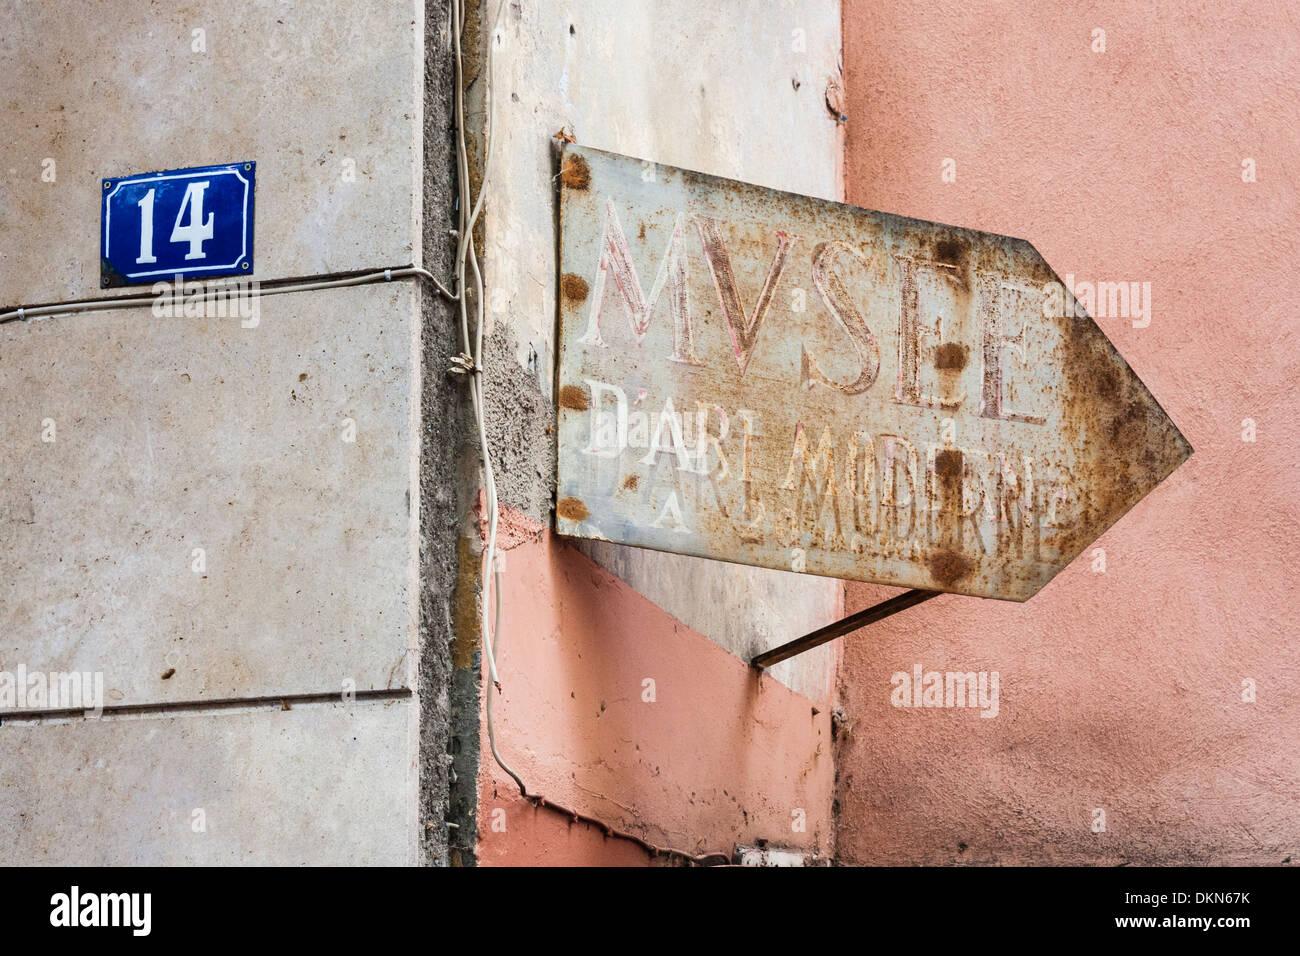 French museum sign stockfotos french museum sign bilder - Bureau des hypotheques de paris ...